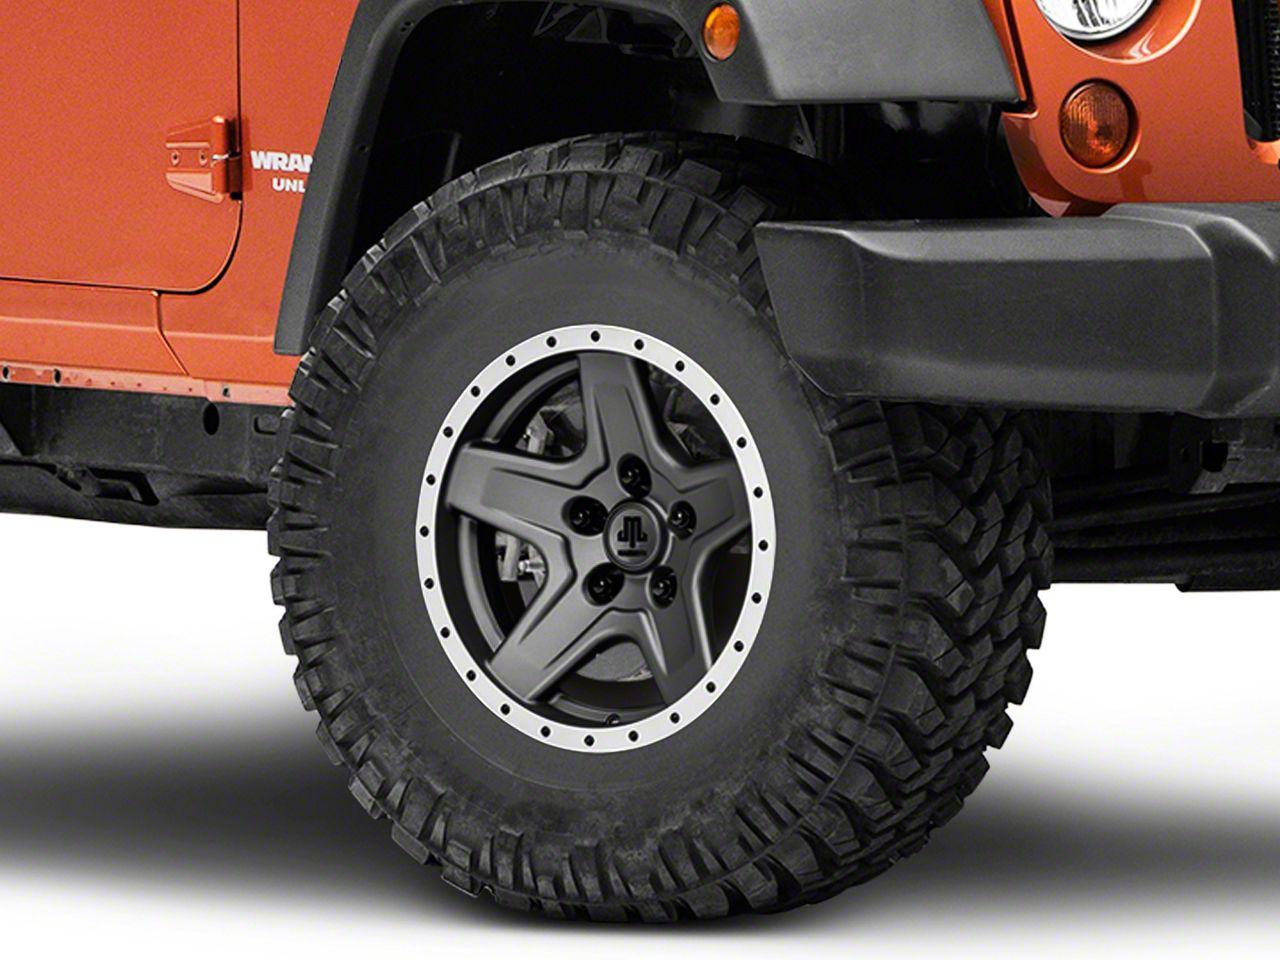 Mammoth Wrangler Bead Lock Style Charcoal Wheel J100626